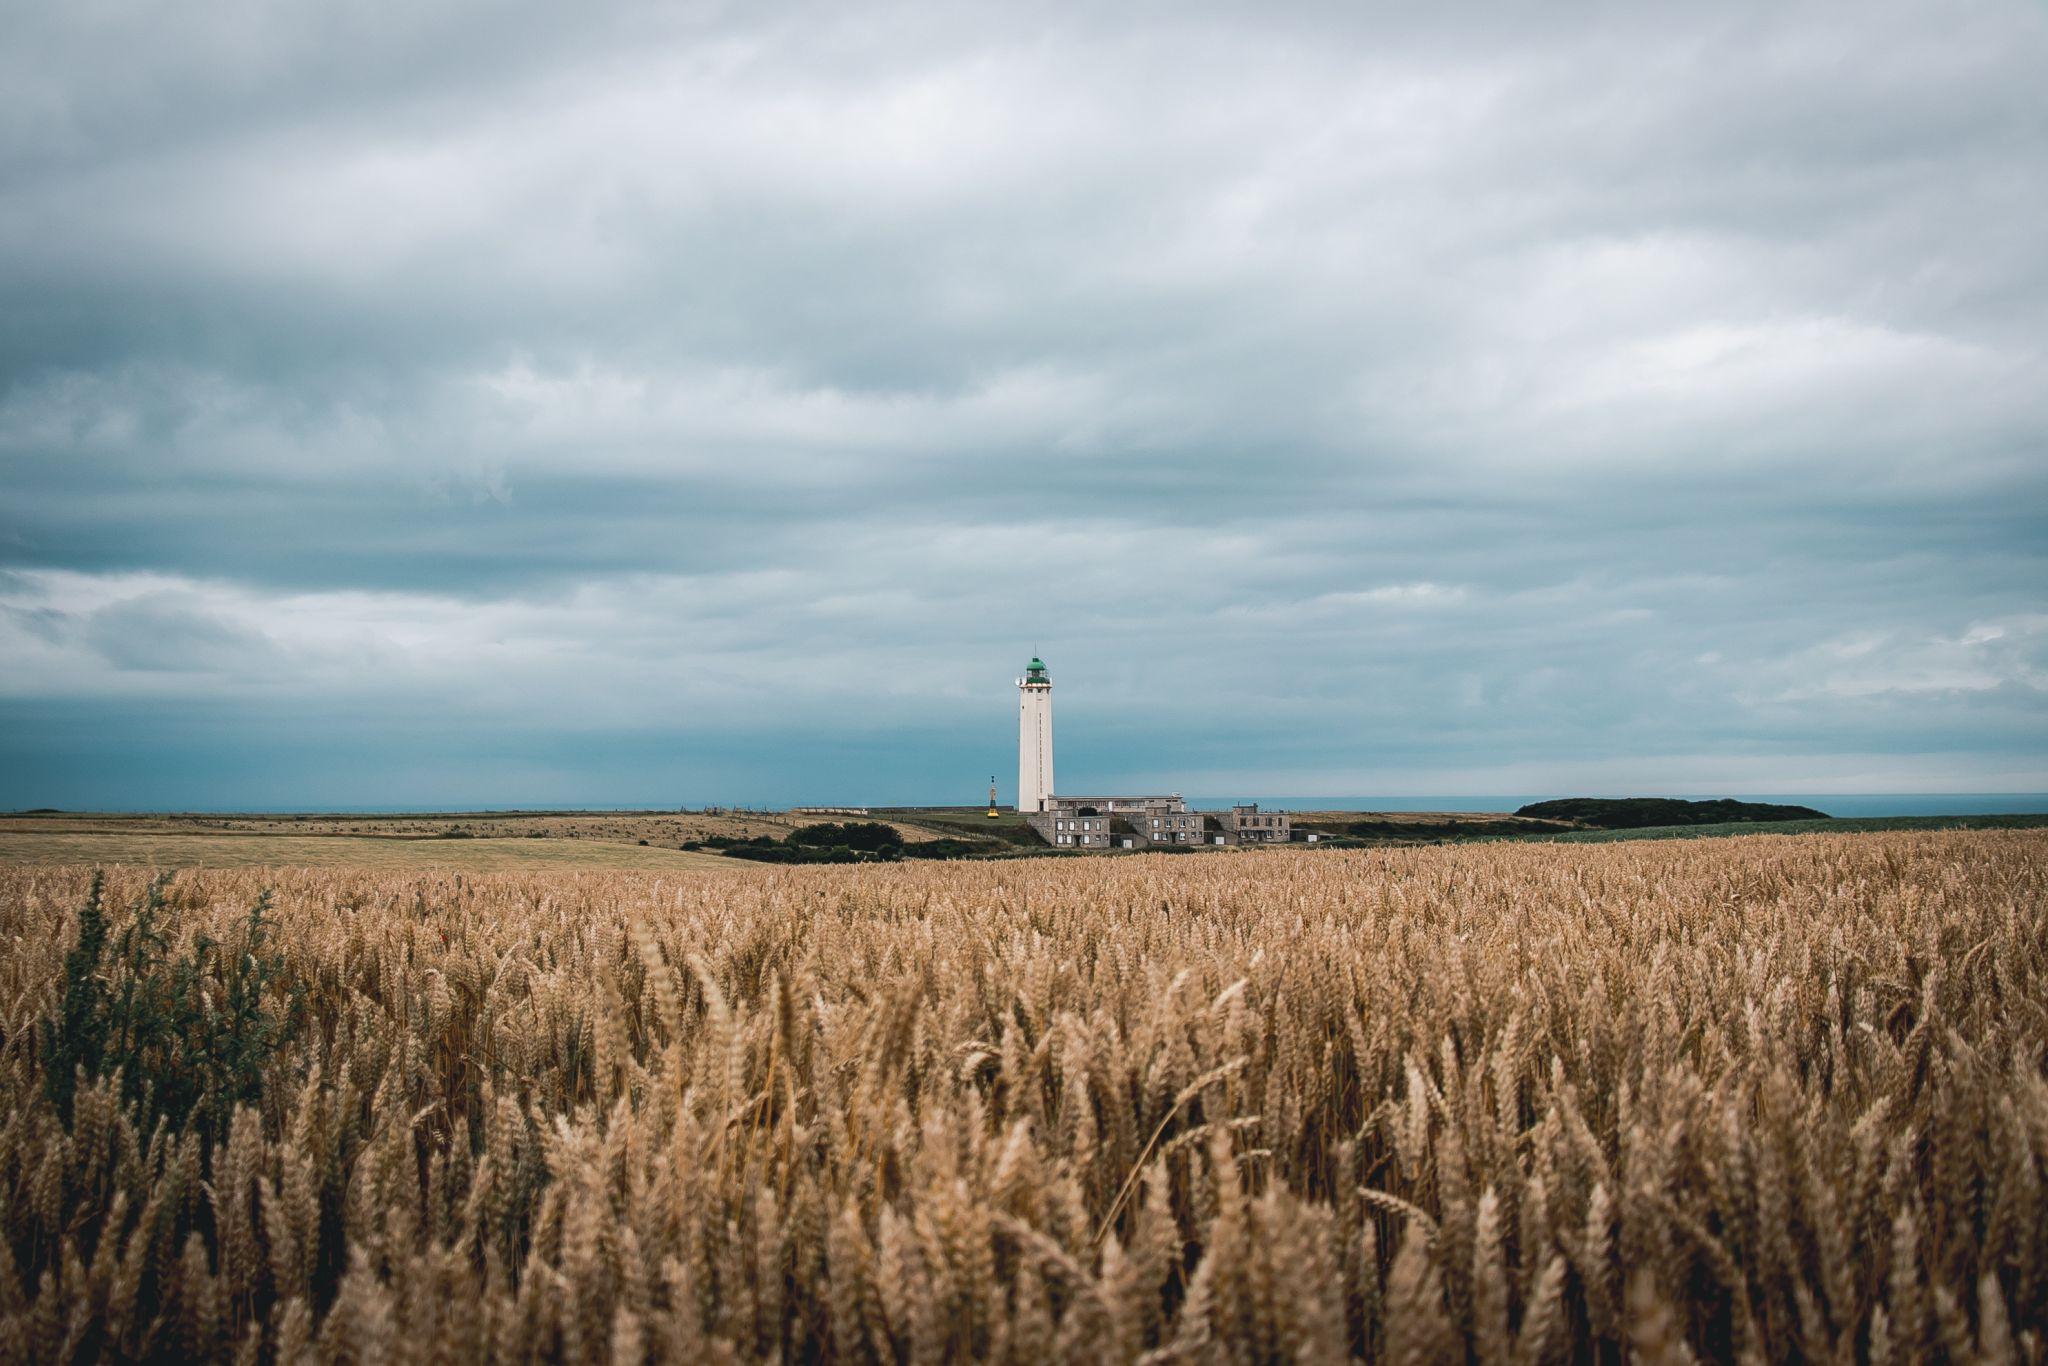 Antifer Lighthouse, France